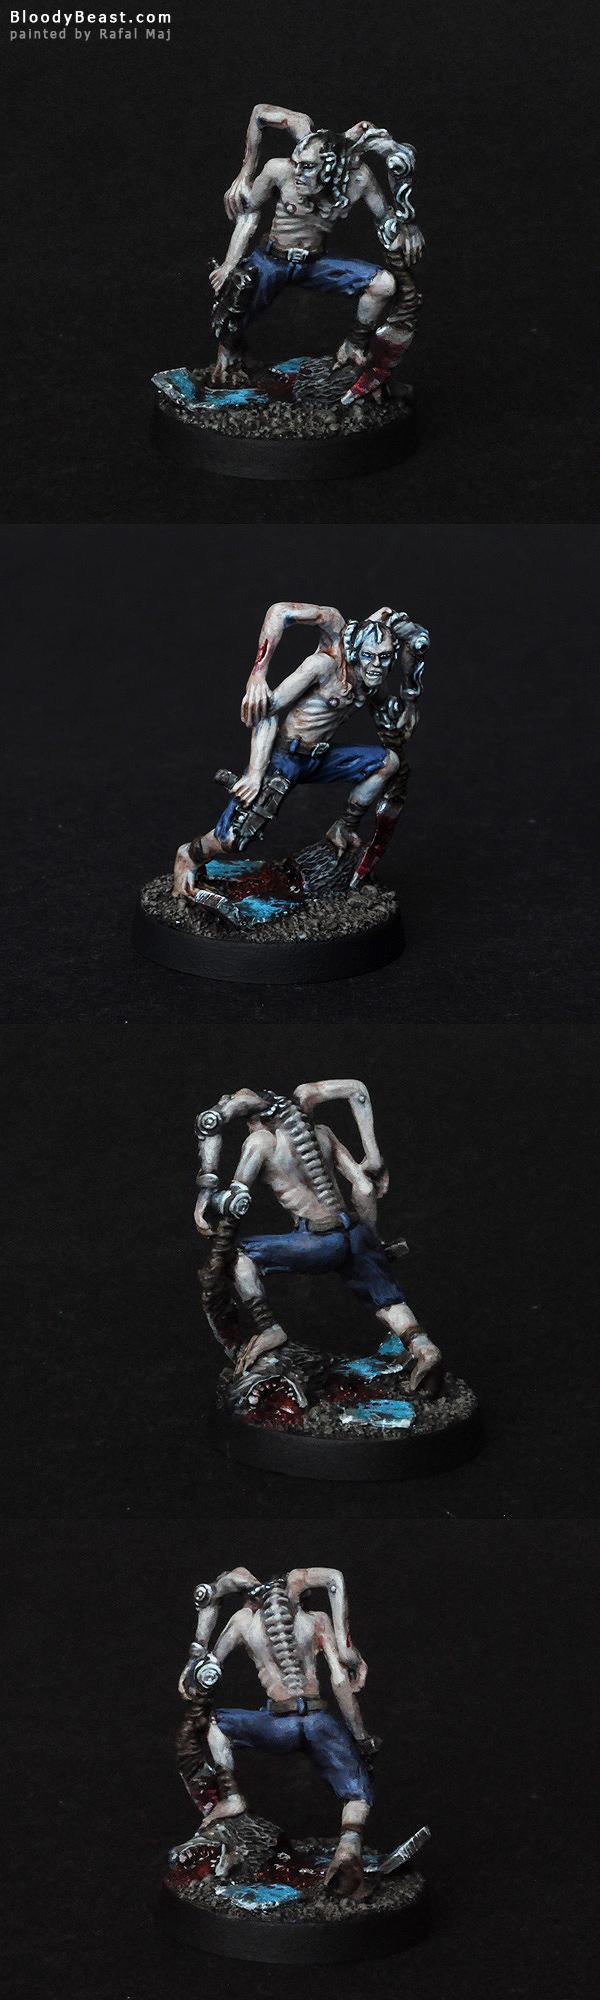 Borgo Spider painted by Rafal Maj (BloodyBeast.com)